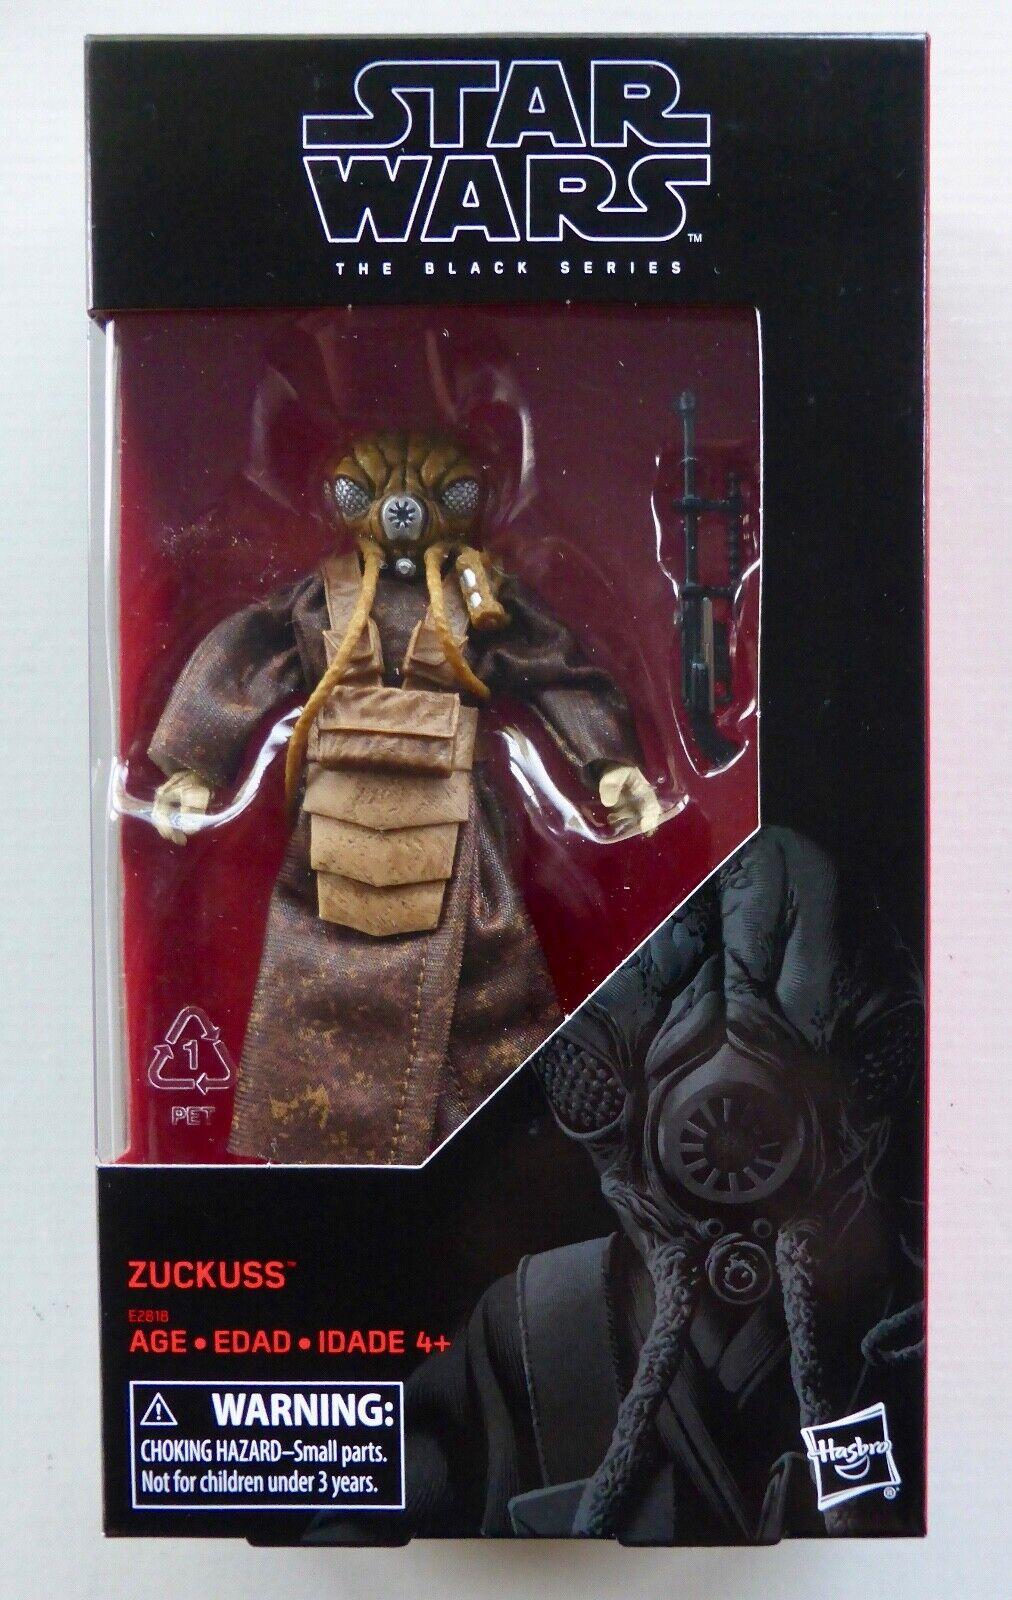 STAR WARS BLACK Series ZUCKUSS 6in Action Figure Hasbro IN STOCK E2818